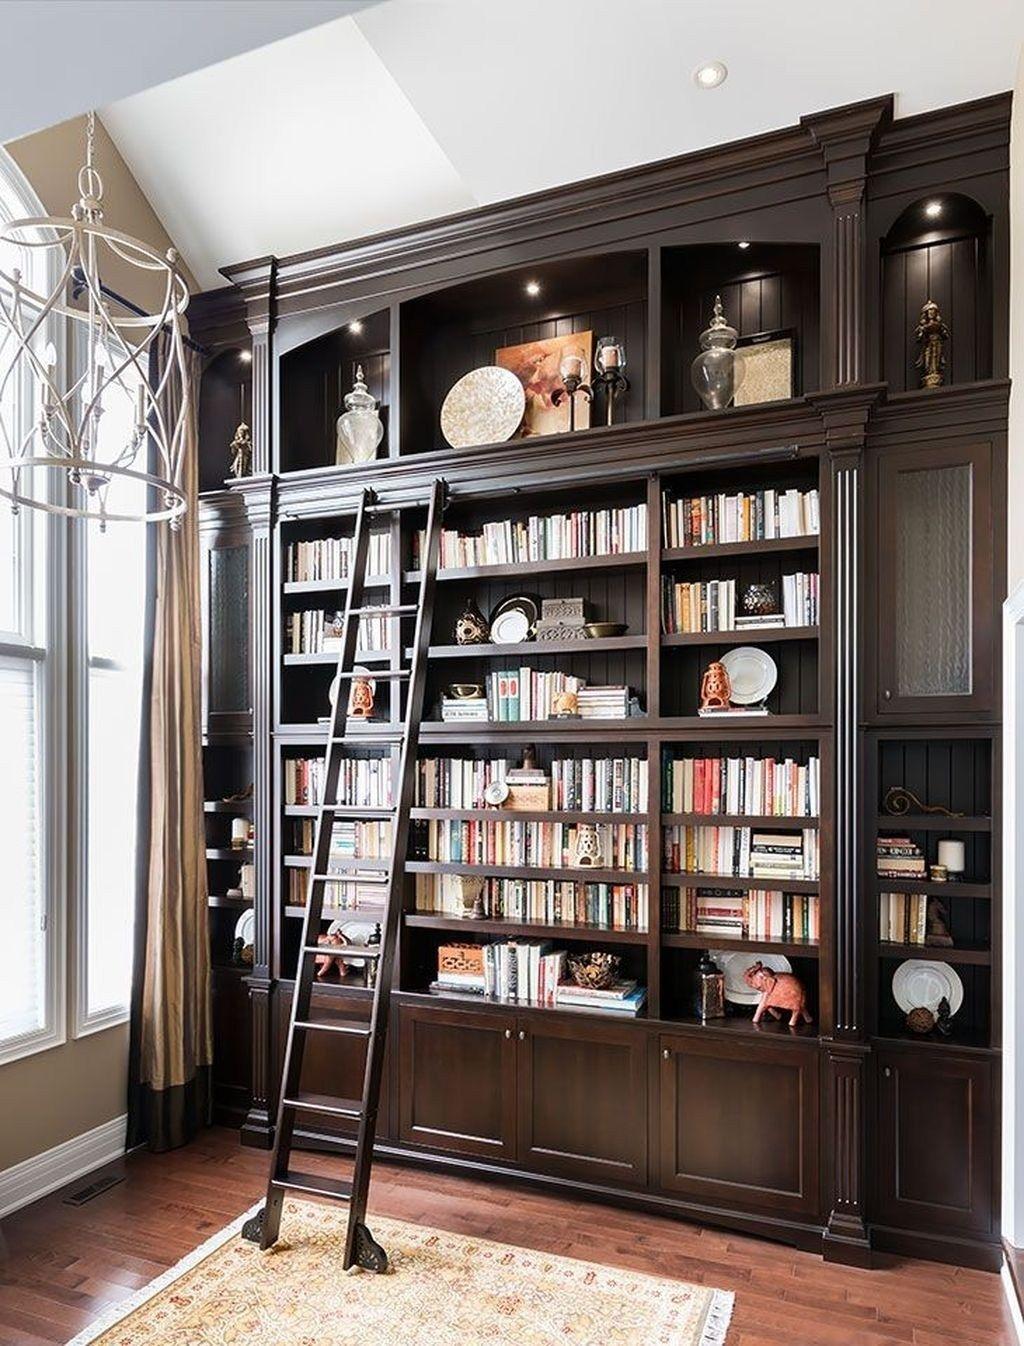 Living Room Library Design Ideas: 20+ Brilliant Bookshelves Design Ideas For Your Living